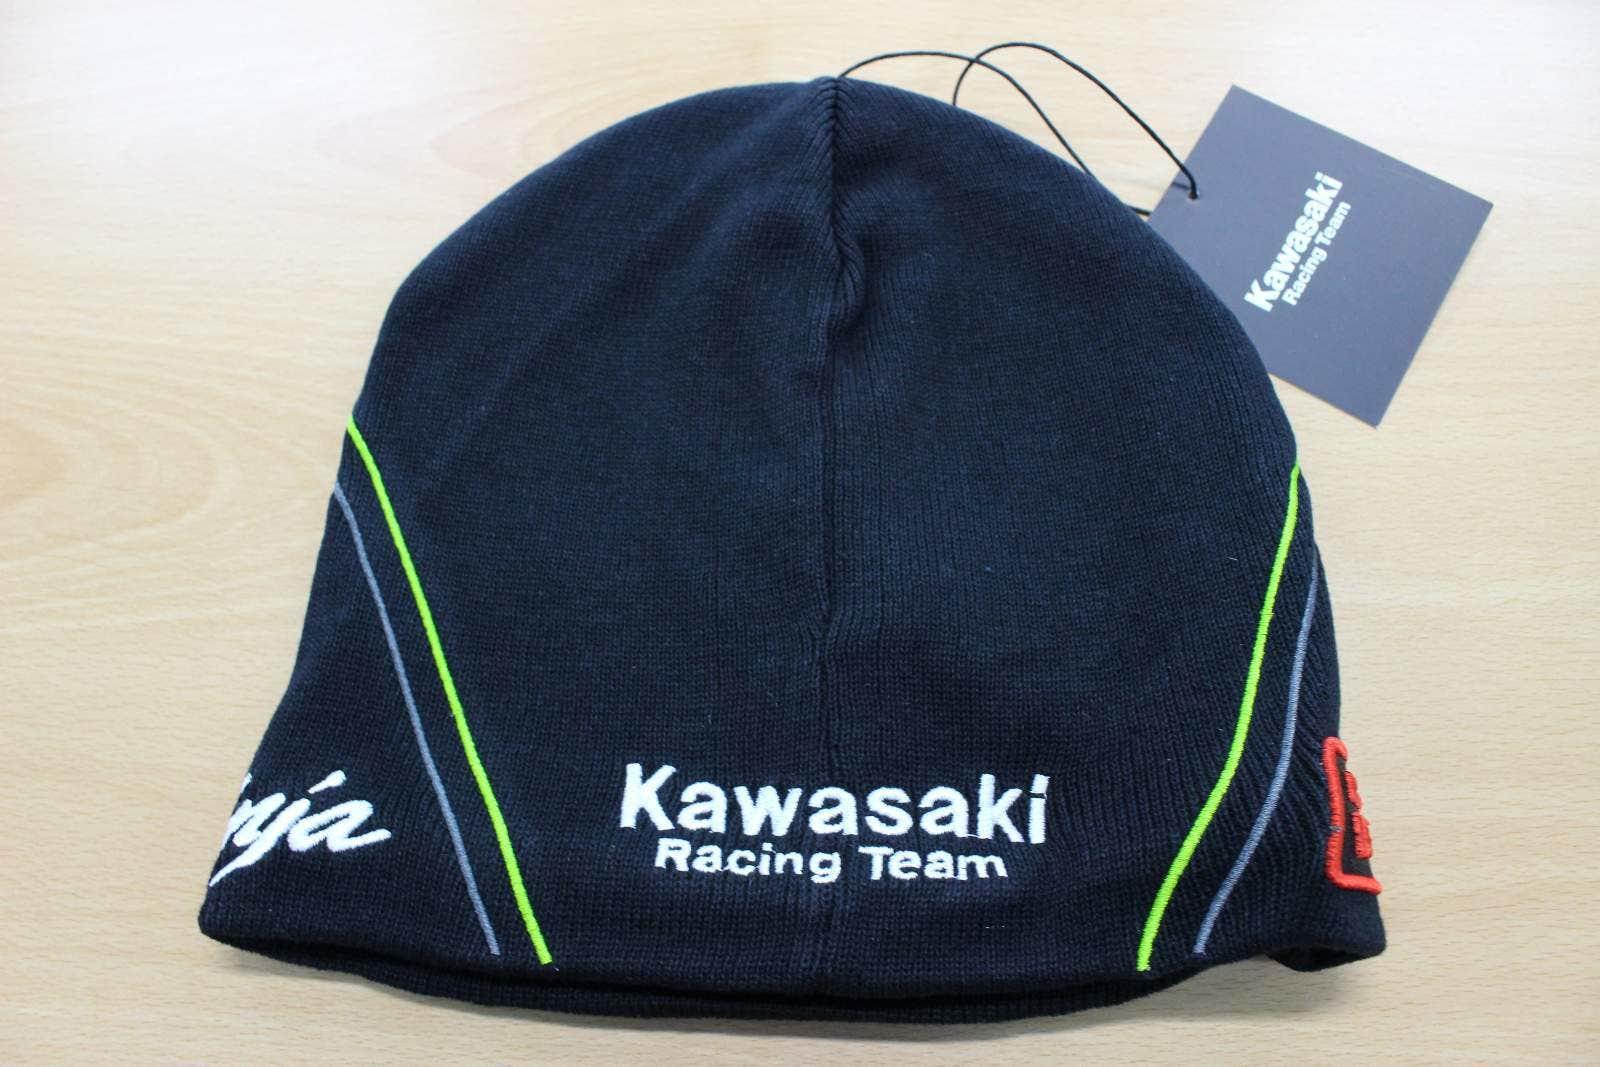 Volný čas   Kawasaki  Čepice Jonathan Rea č. 65 s logy Kawasaki ... 52b303fa66